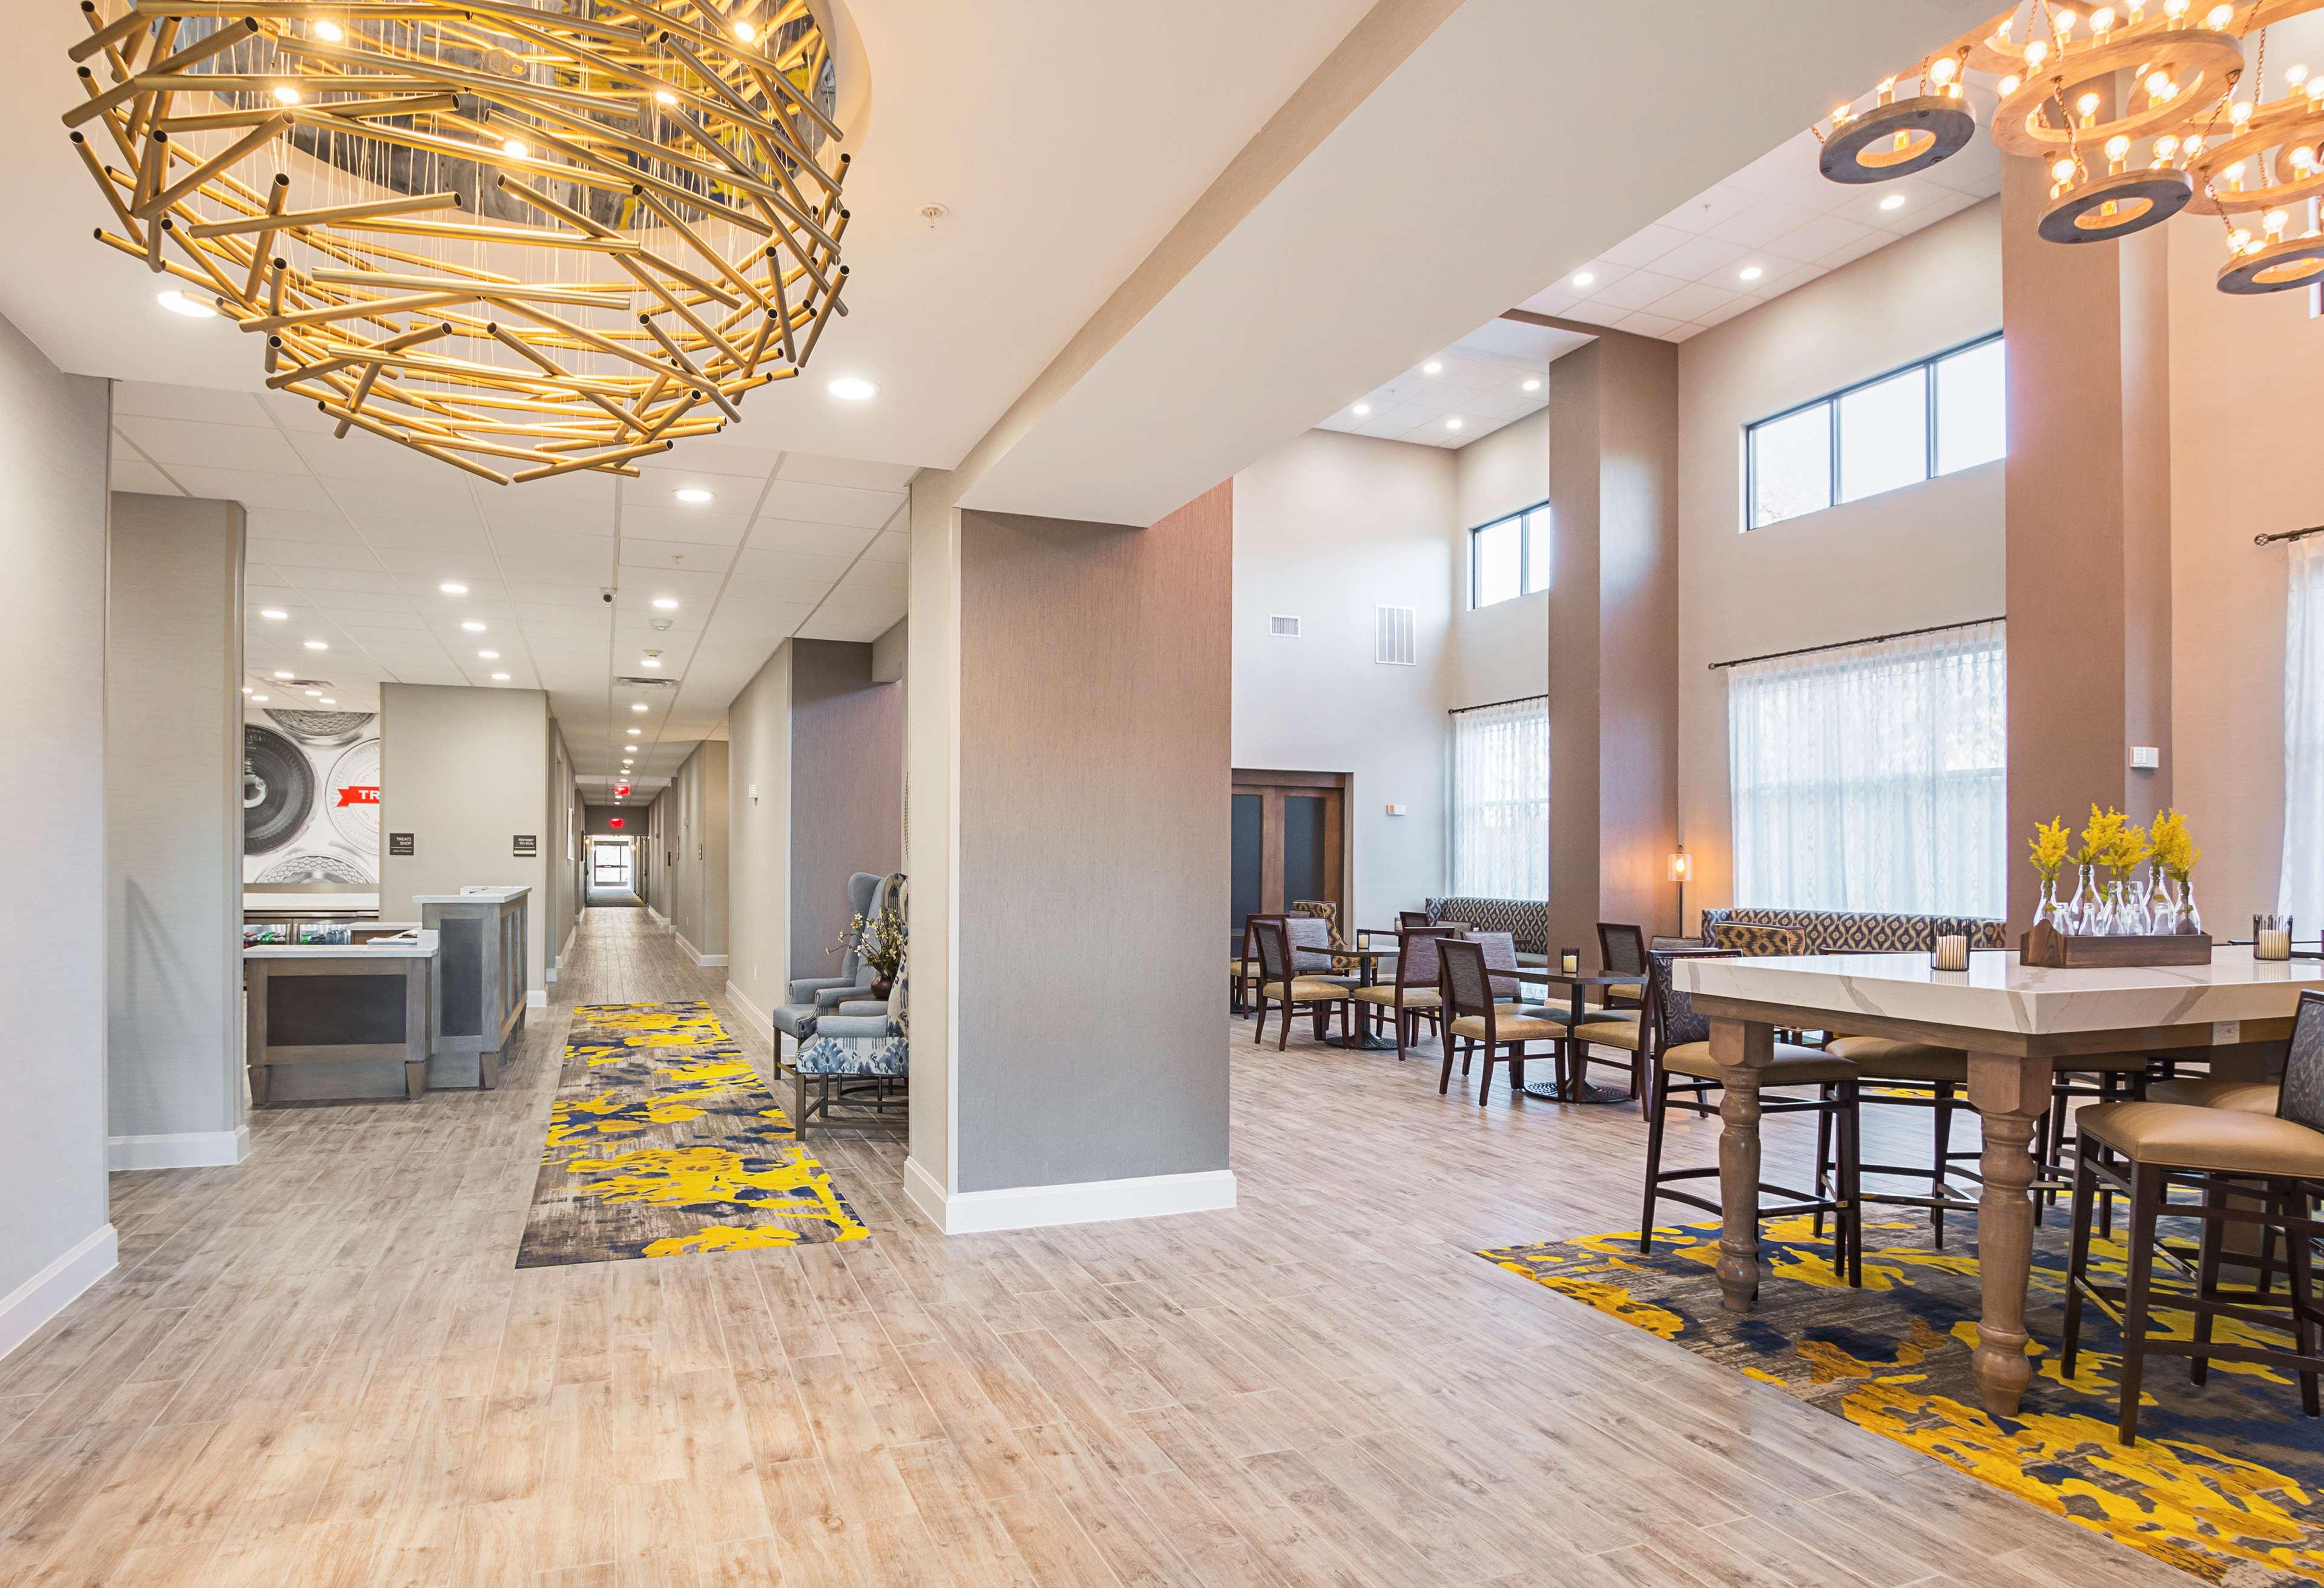 Hampton Inn & Suites Colleyville DFW West image 6